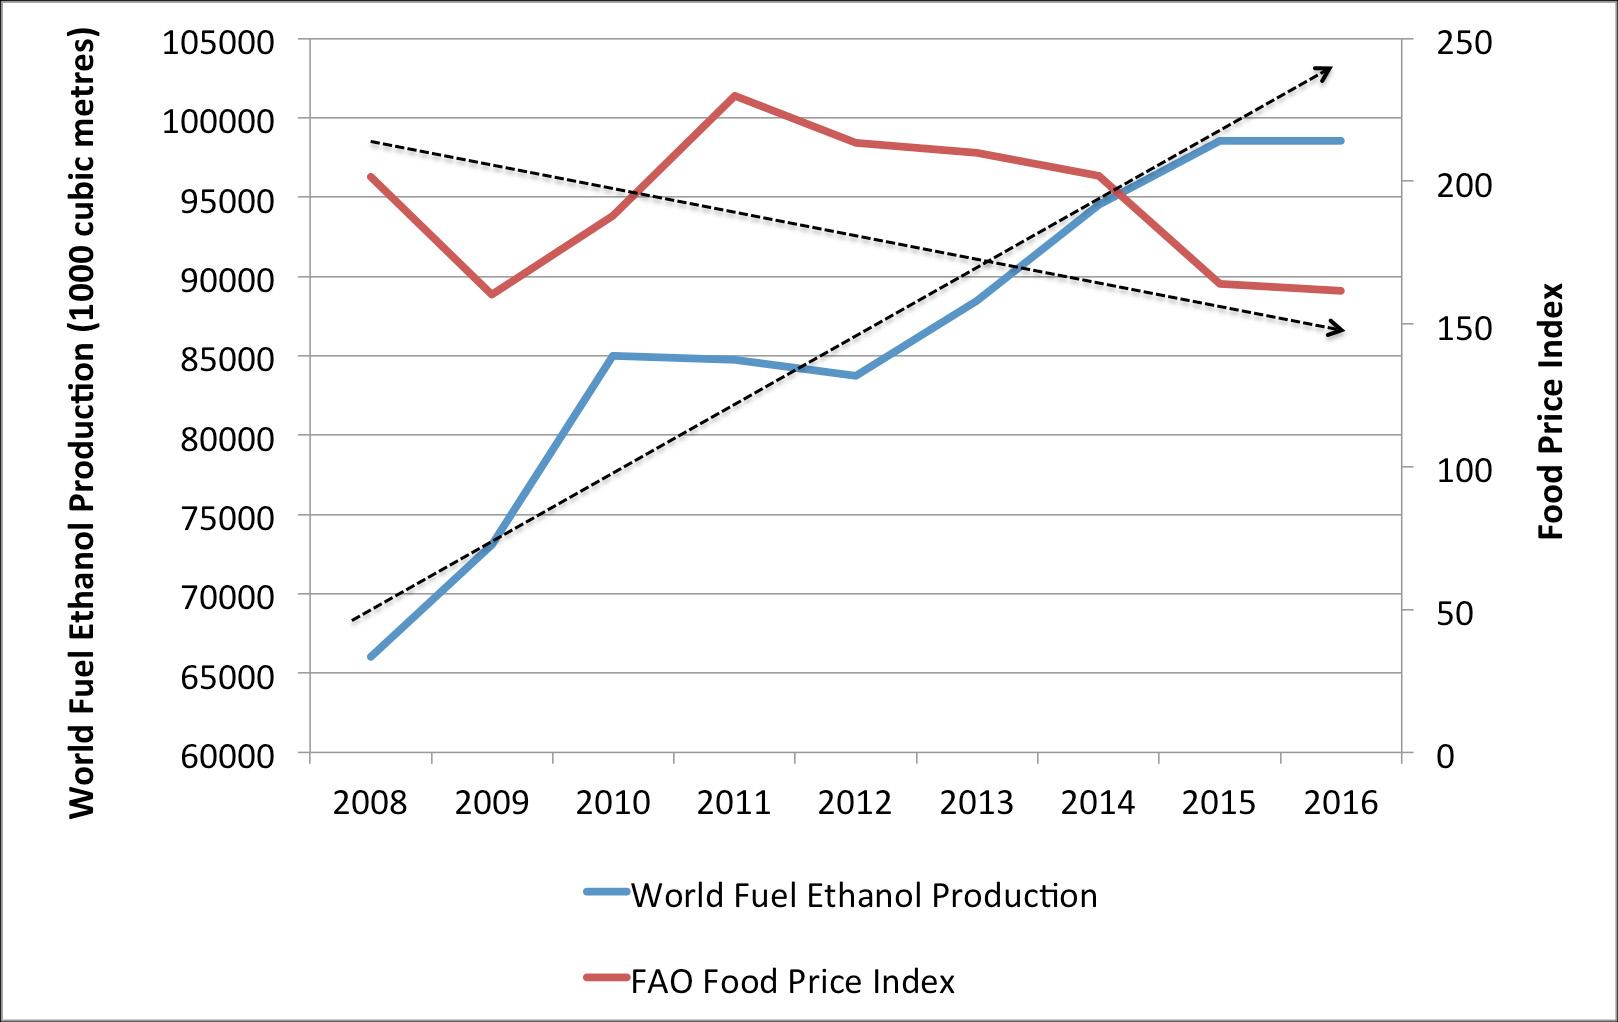 GRFA Charts Global Food Prices vs Ethanol Production | Energy